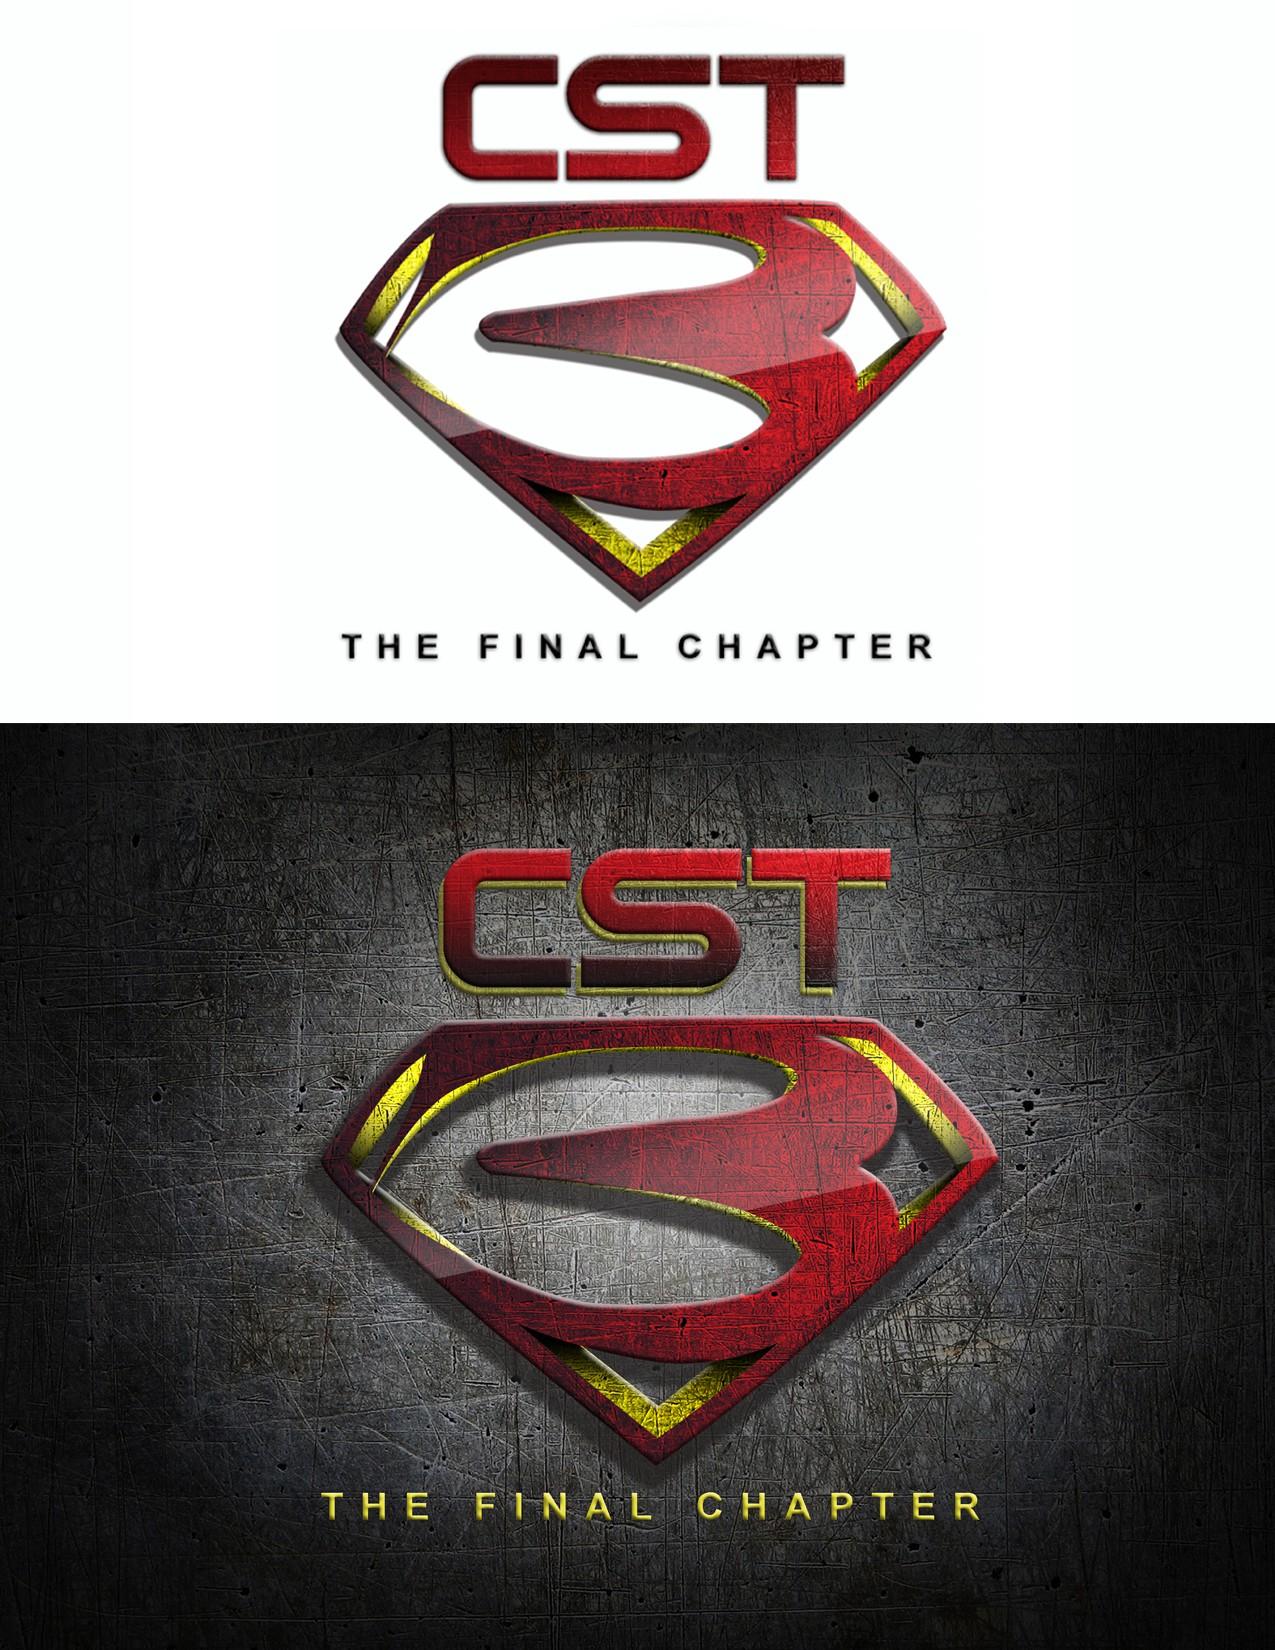 Create a Superman themed logo for a sports training program